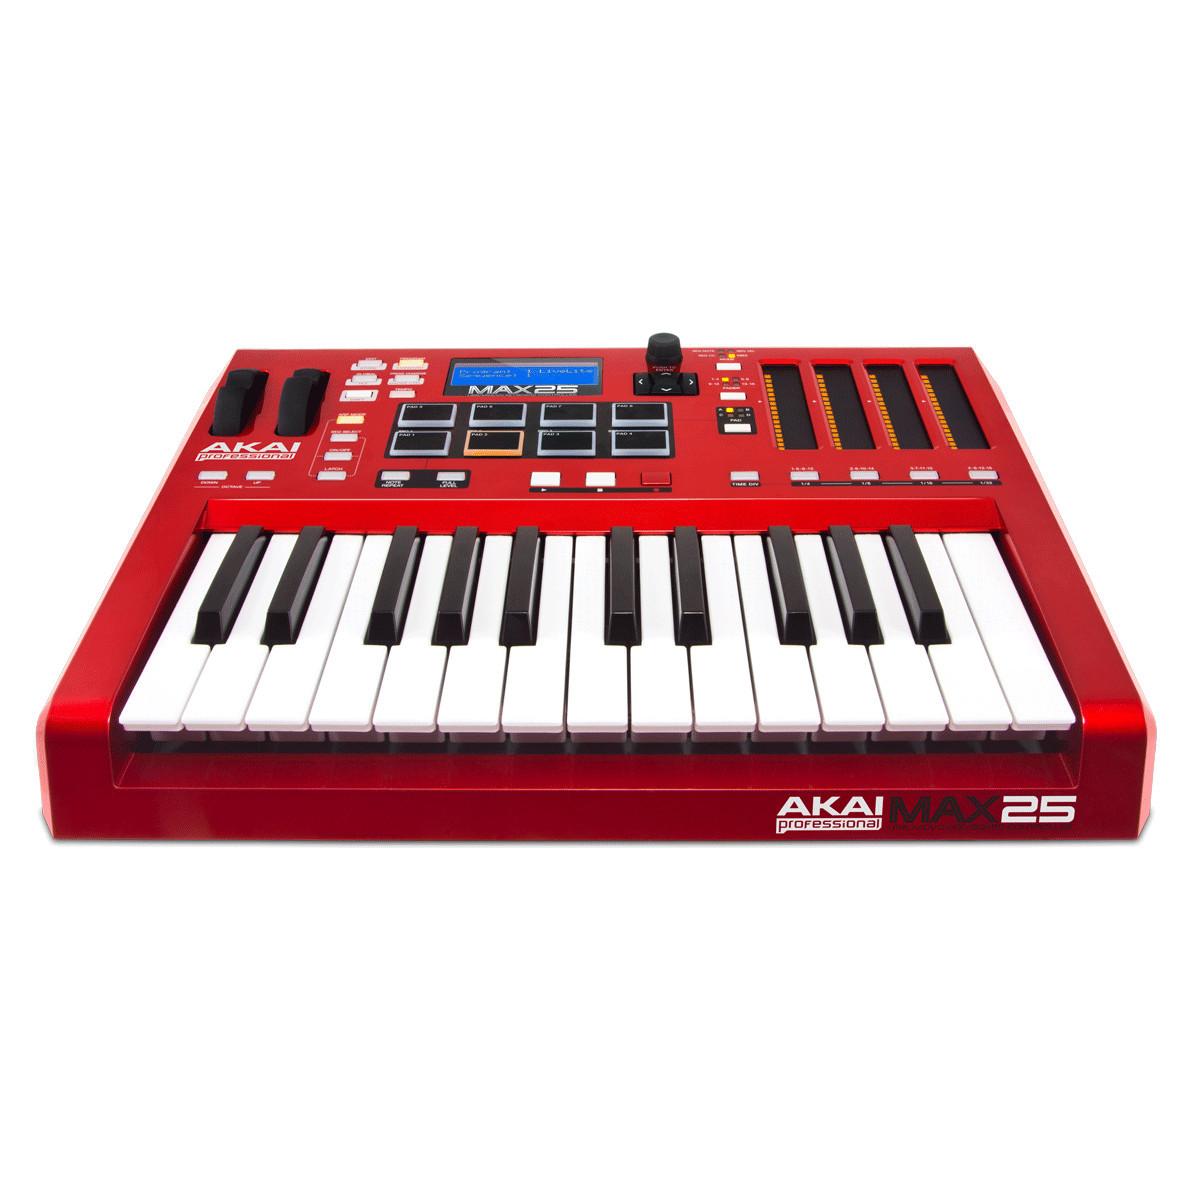 disc akai max 25 compact usb  midi  cv keyboard controller